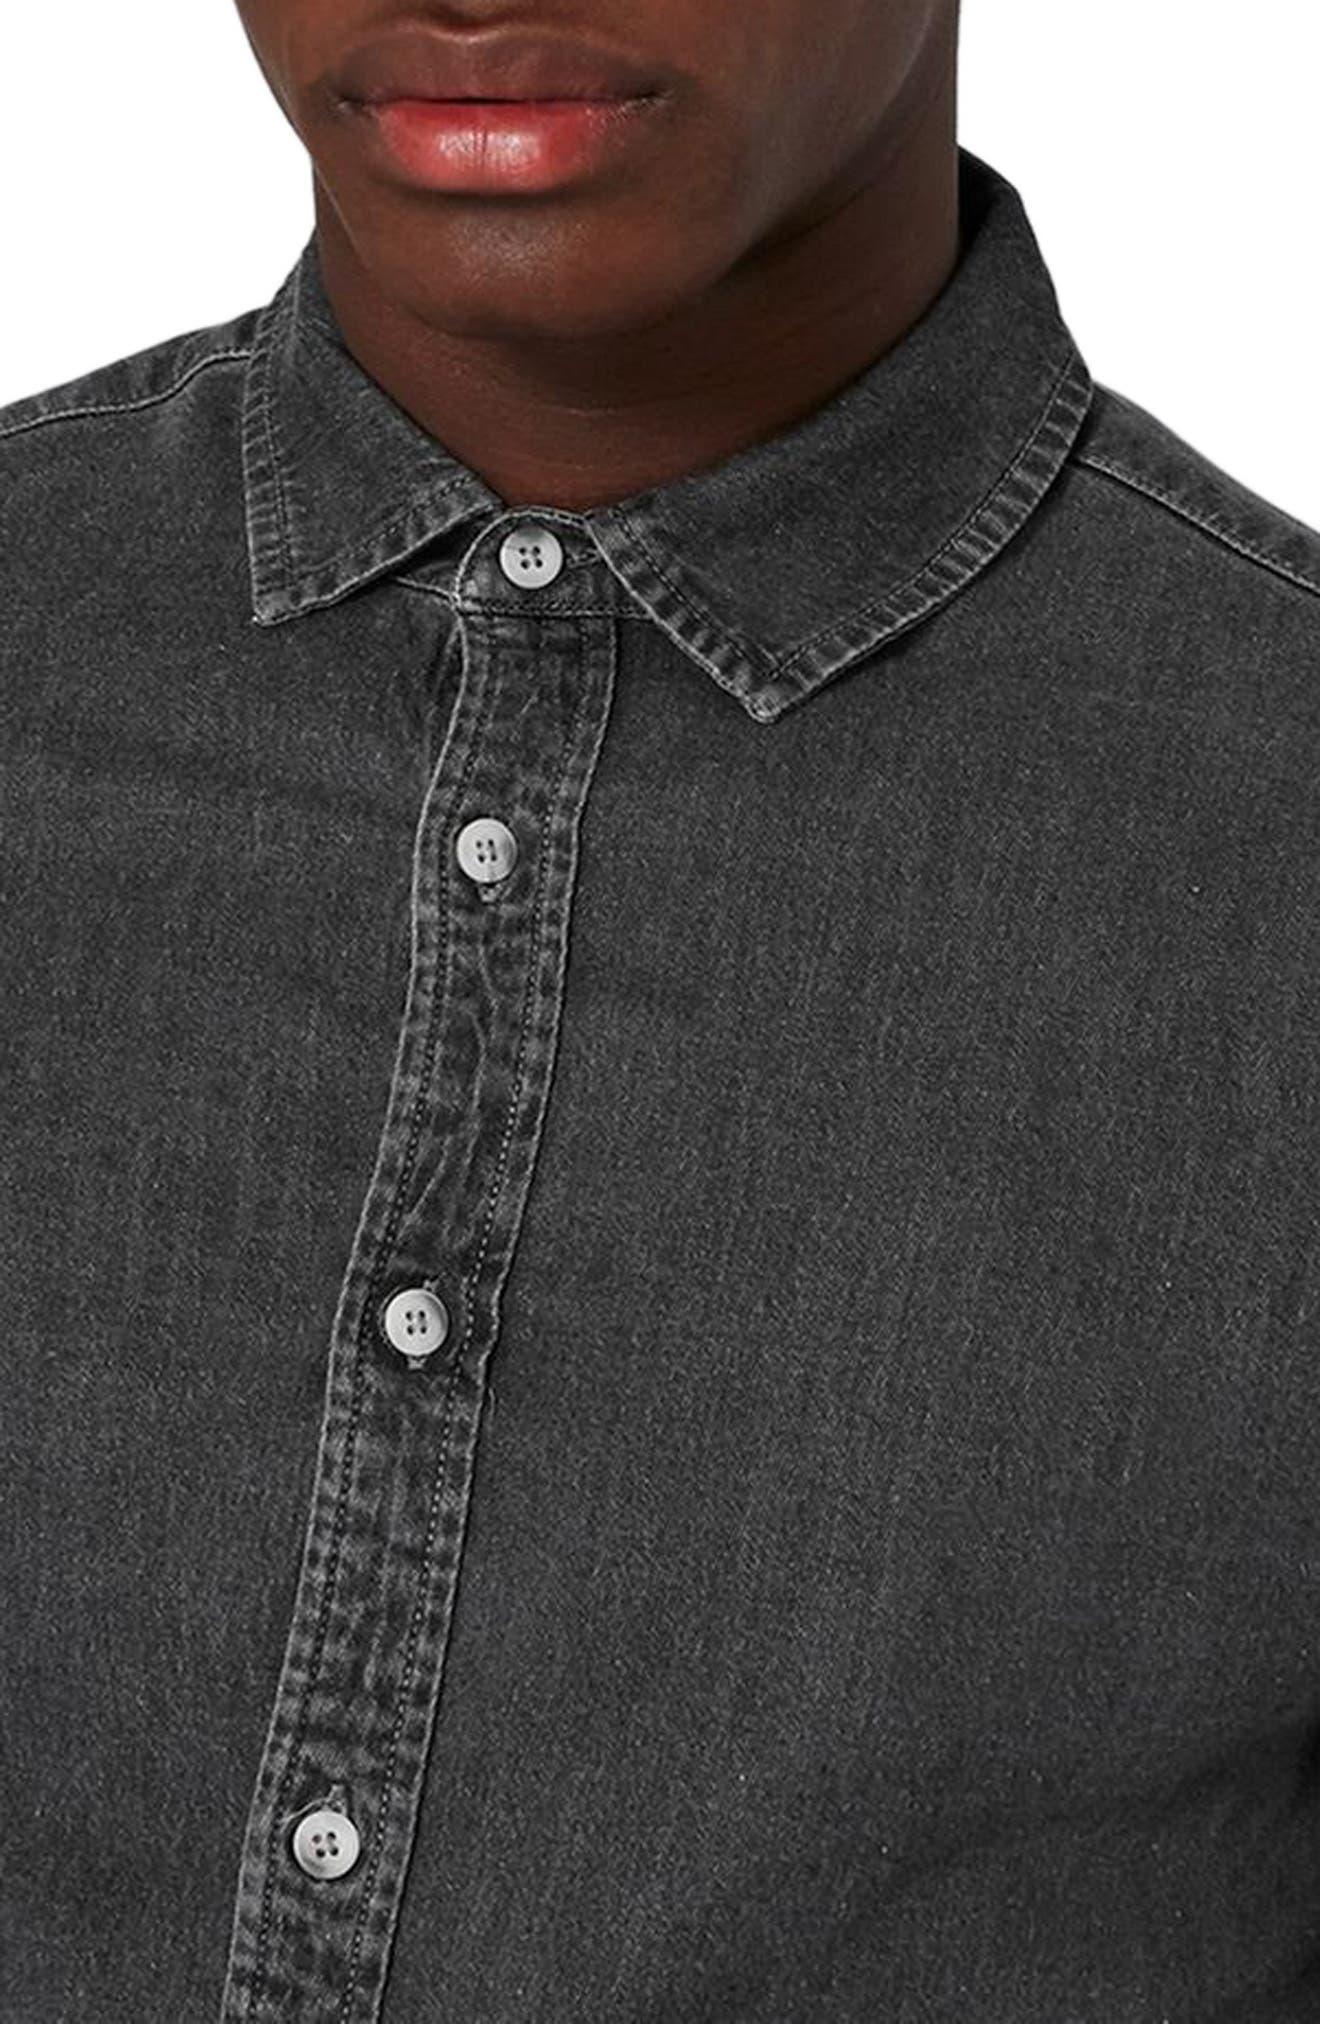 Muscle Fit Bleach Denim Shirt,                             Alternate thumbnail 3, color,                             020